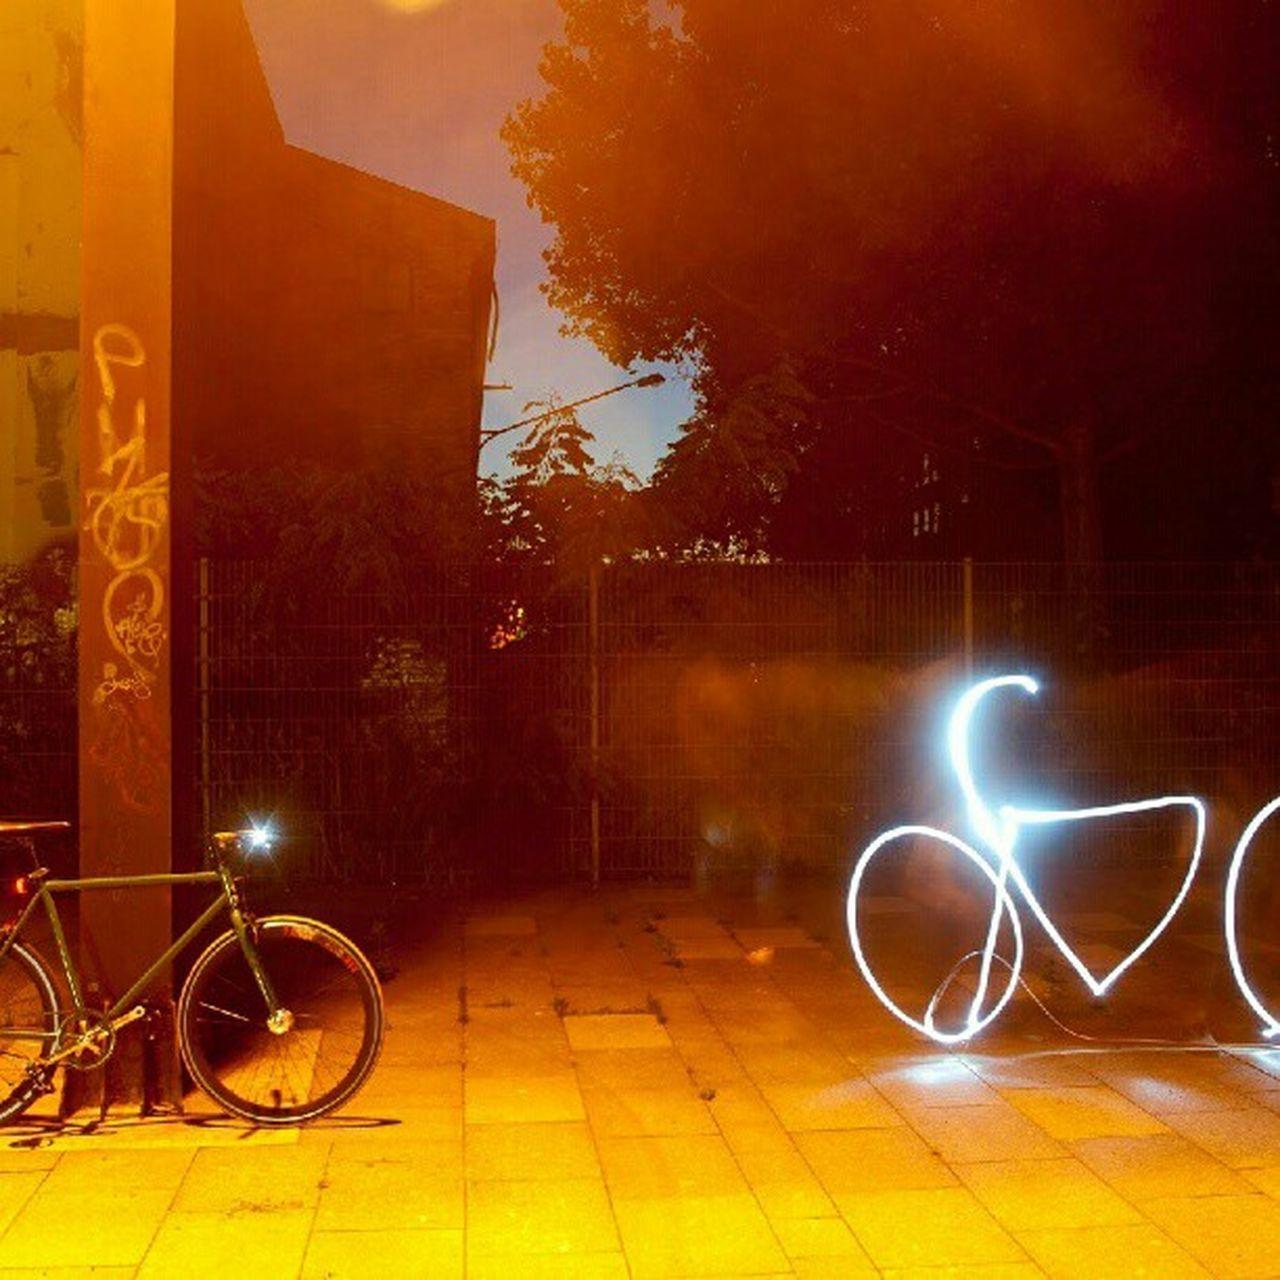 Flash! #light #lightpainting #bikeporn #Batbike #singlespeed #bike #lightporn #outdoor #shadow Shadow Lightpainting Outdoor Bikeporn Singlespeed Batbike Lightporn Light Bike